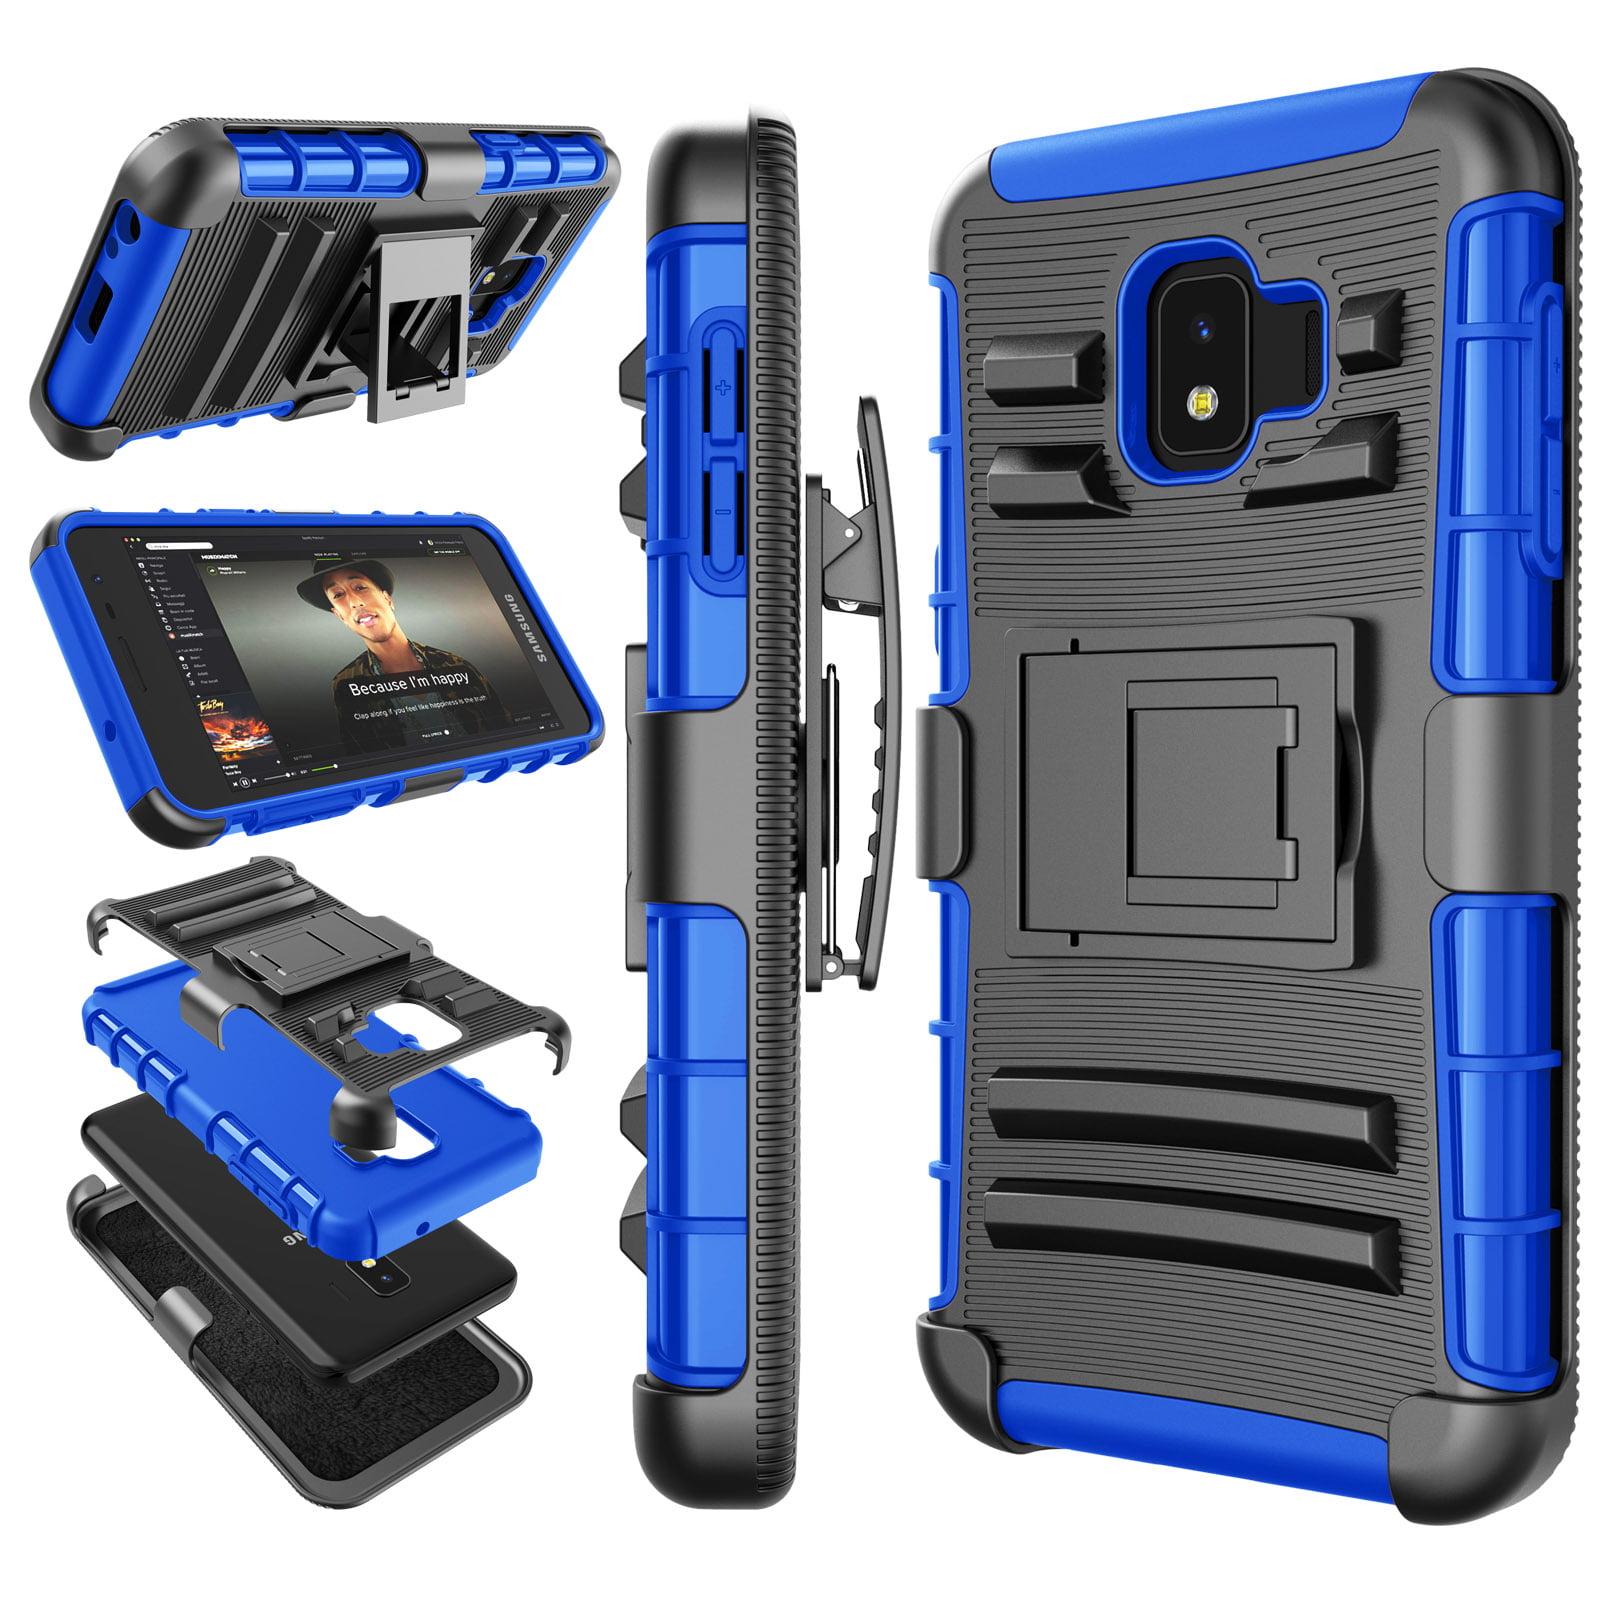 Galaxy J2 Core Case Samsung J2 Dash J2 Pure J260 Holster Clip Tekcoo Hoplite Shock Absorbing Swivel Locking Belt Defender Full Body Kickstand Carrying Armor Sturdy Phone Cases Cover Black